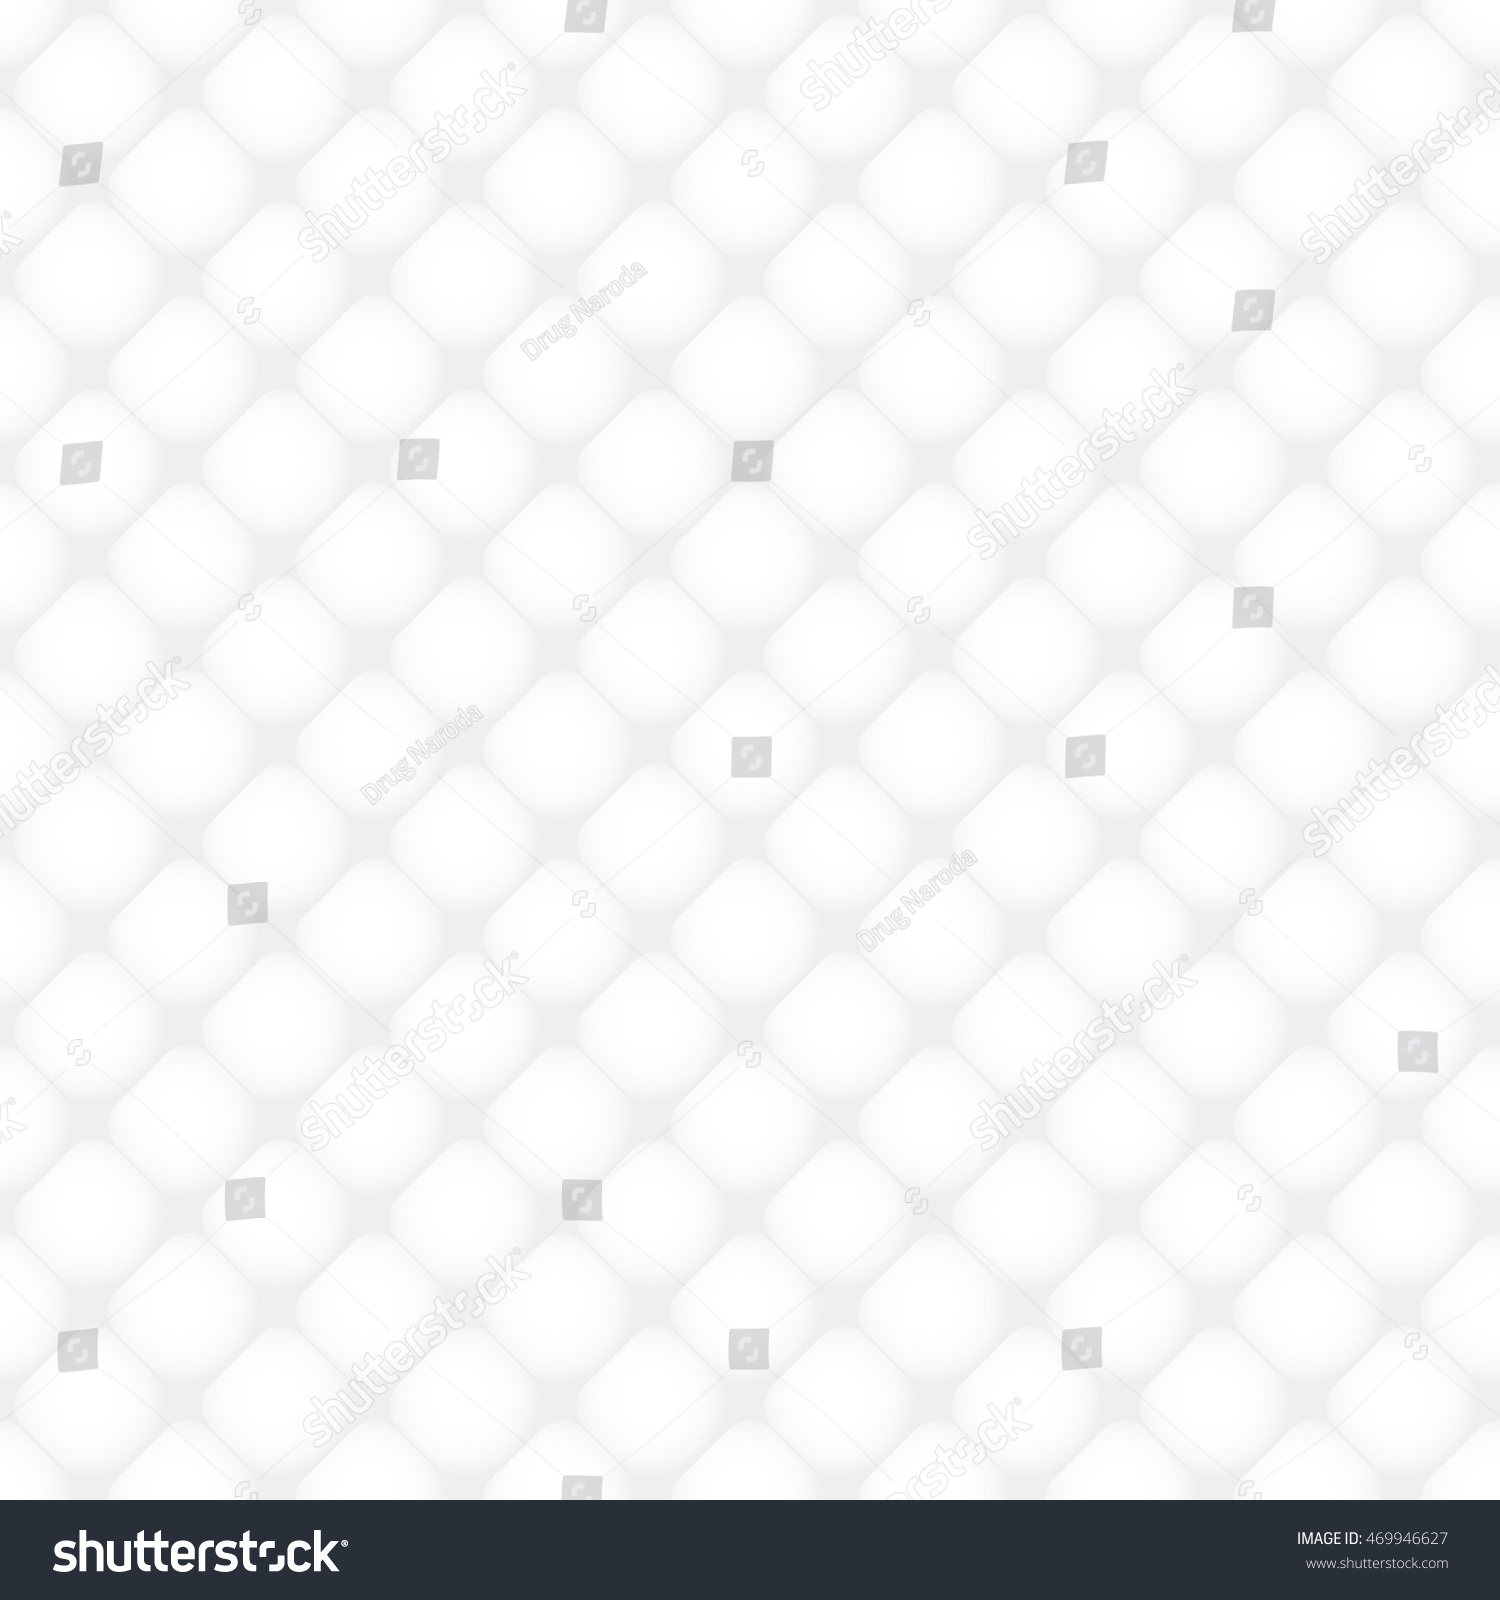 seamless mattress texture. Mattress Texture Seamless Pattern - White To Grey Elements On Darker Background Realistic Illusion Gradient